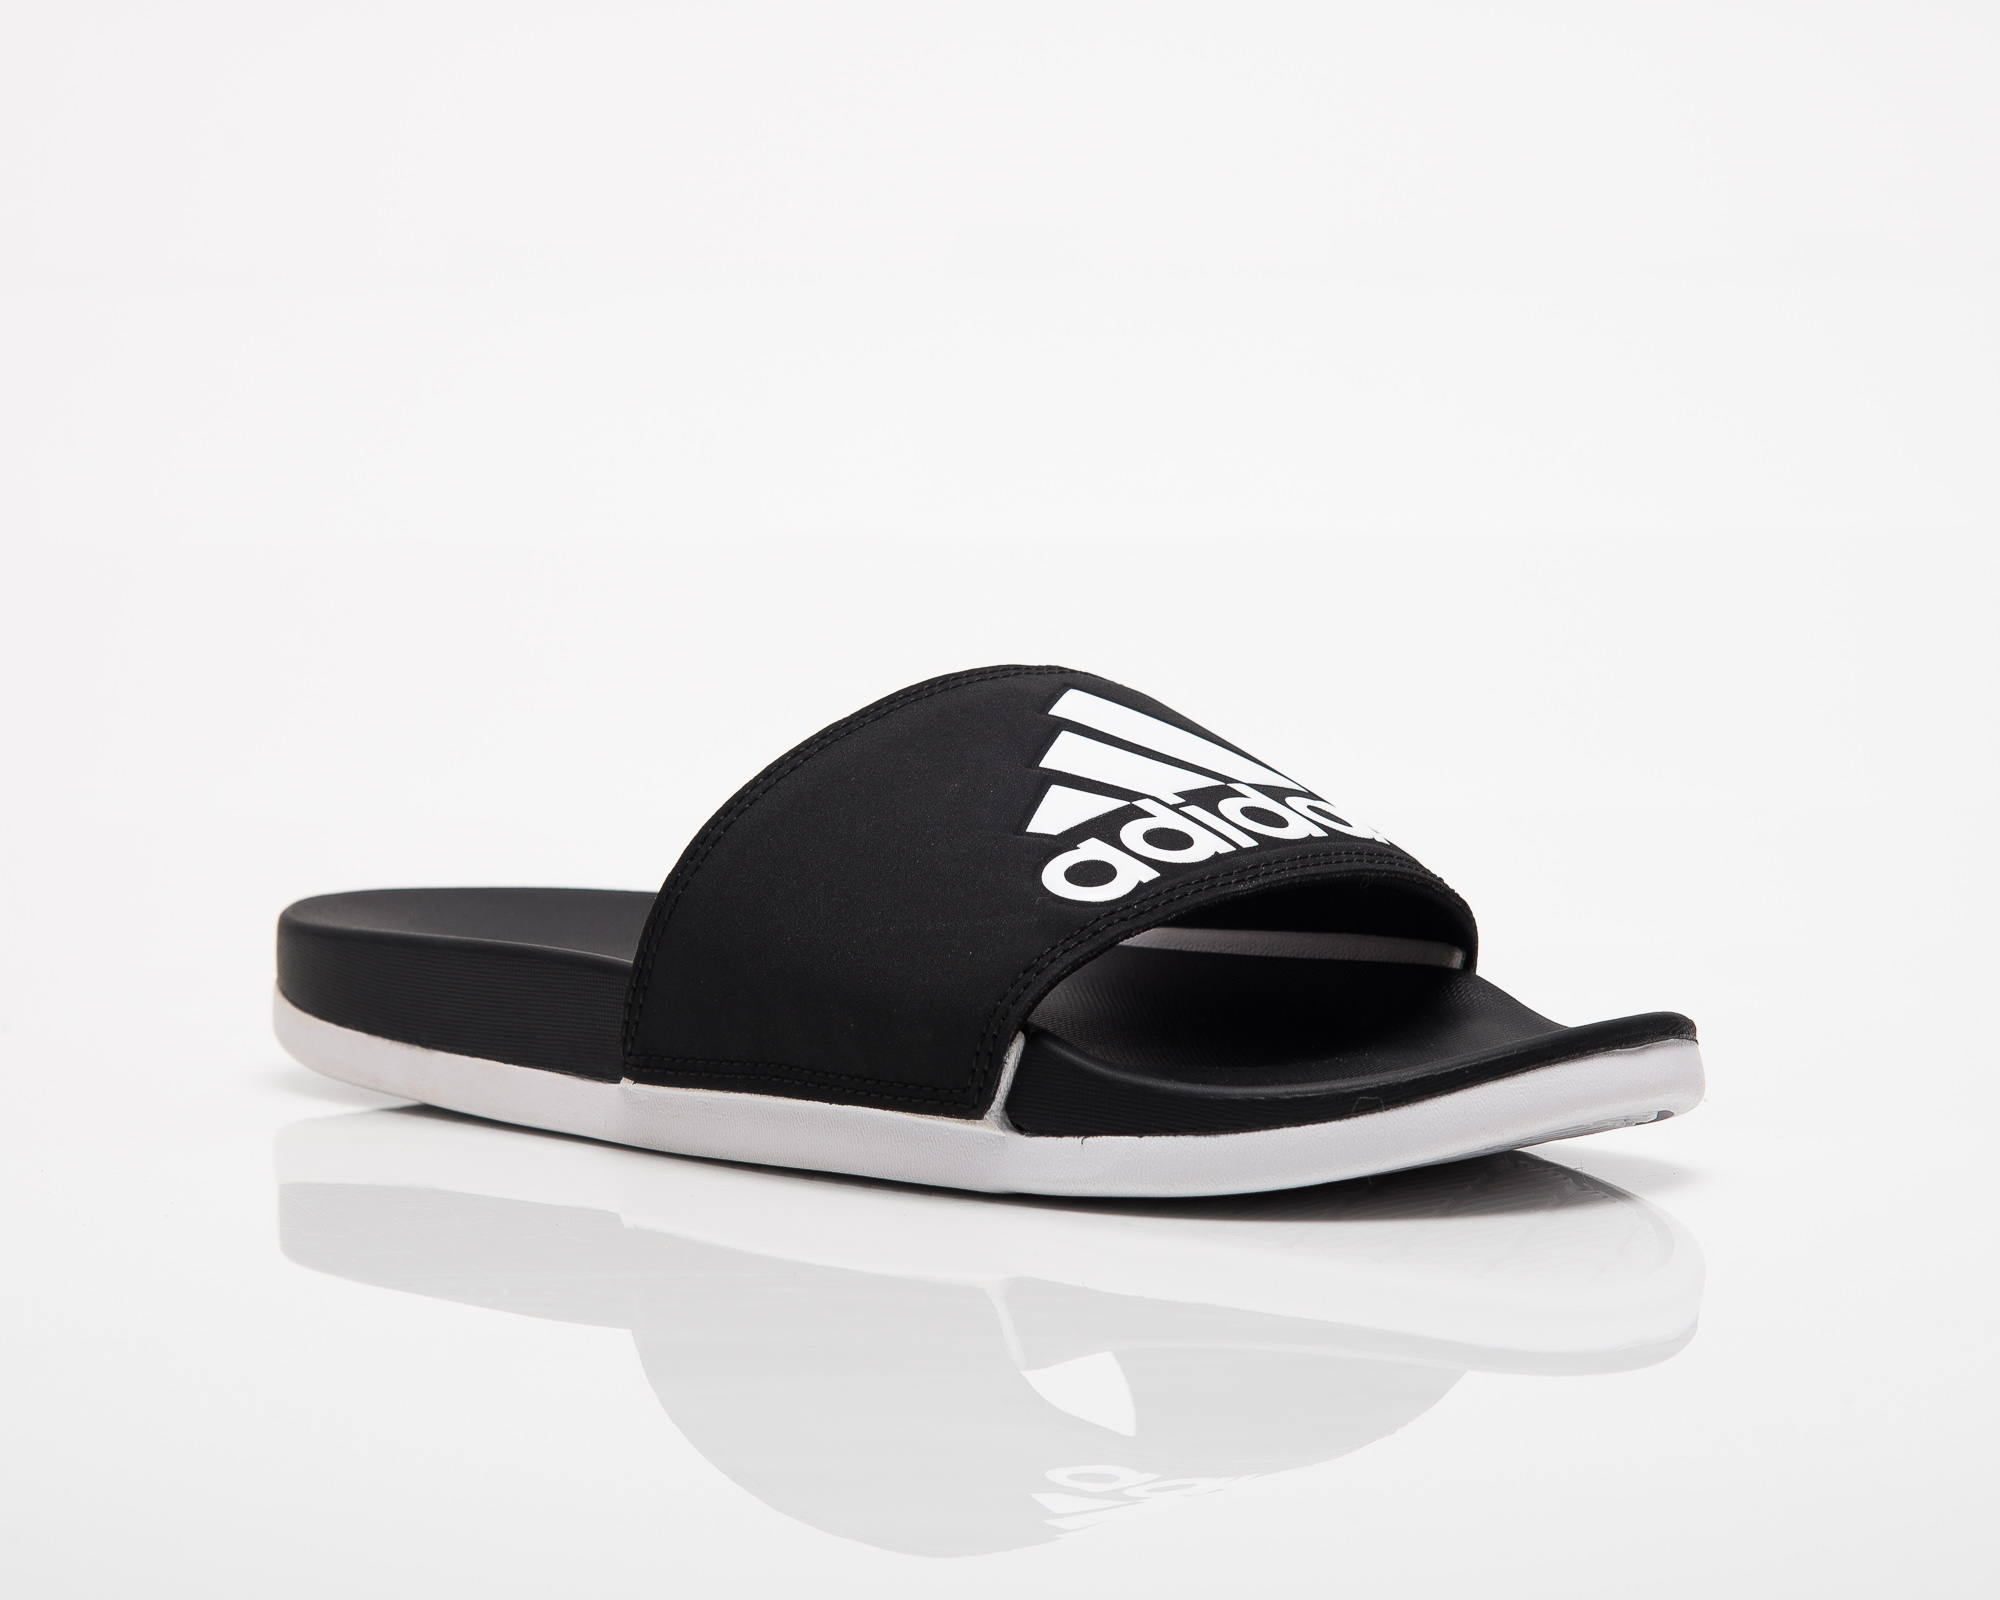 509f00568392 adidas Adilette Cloudfoam Plus Logo Slides - Shoes Slides - Sporting ...